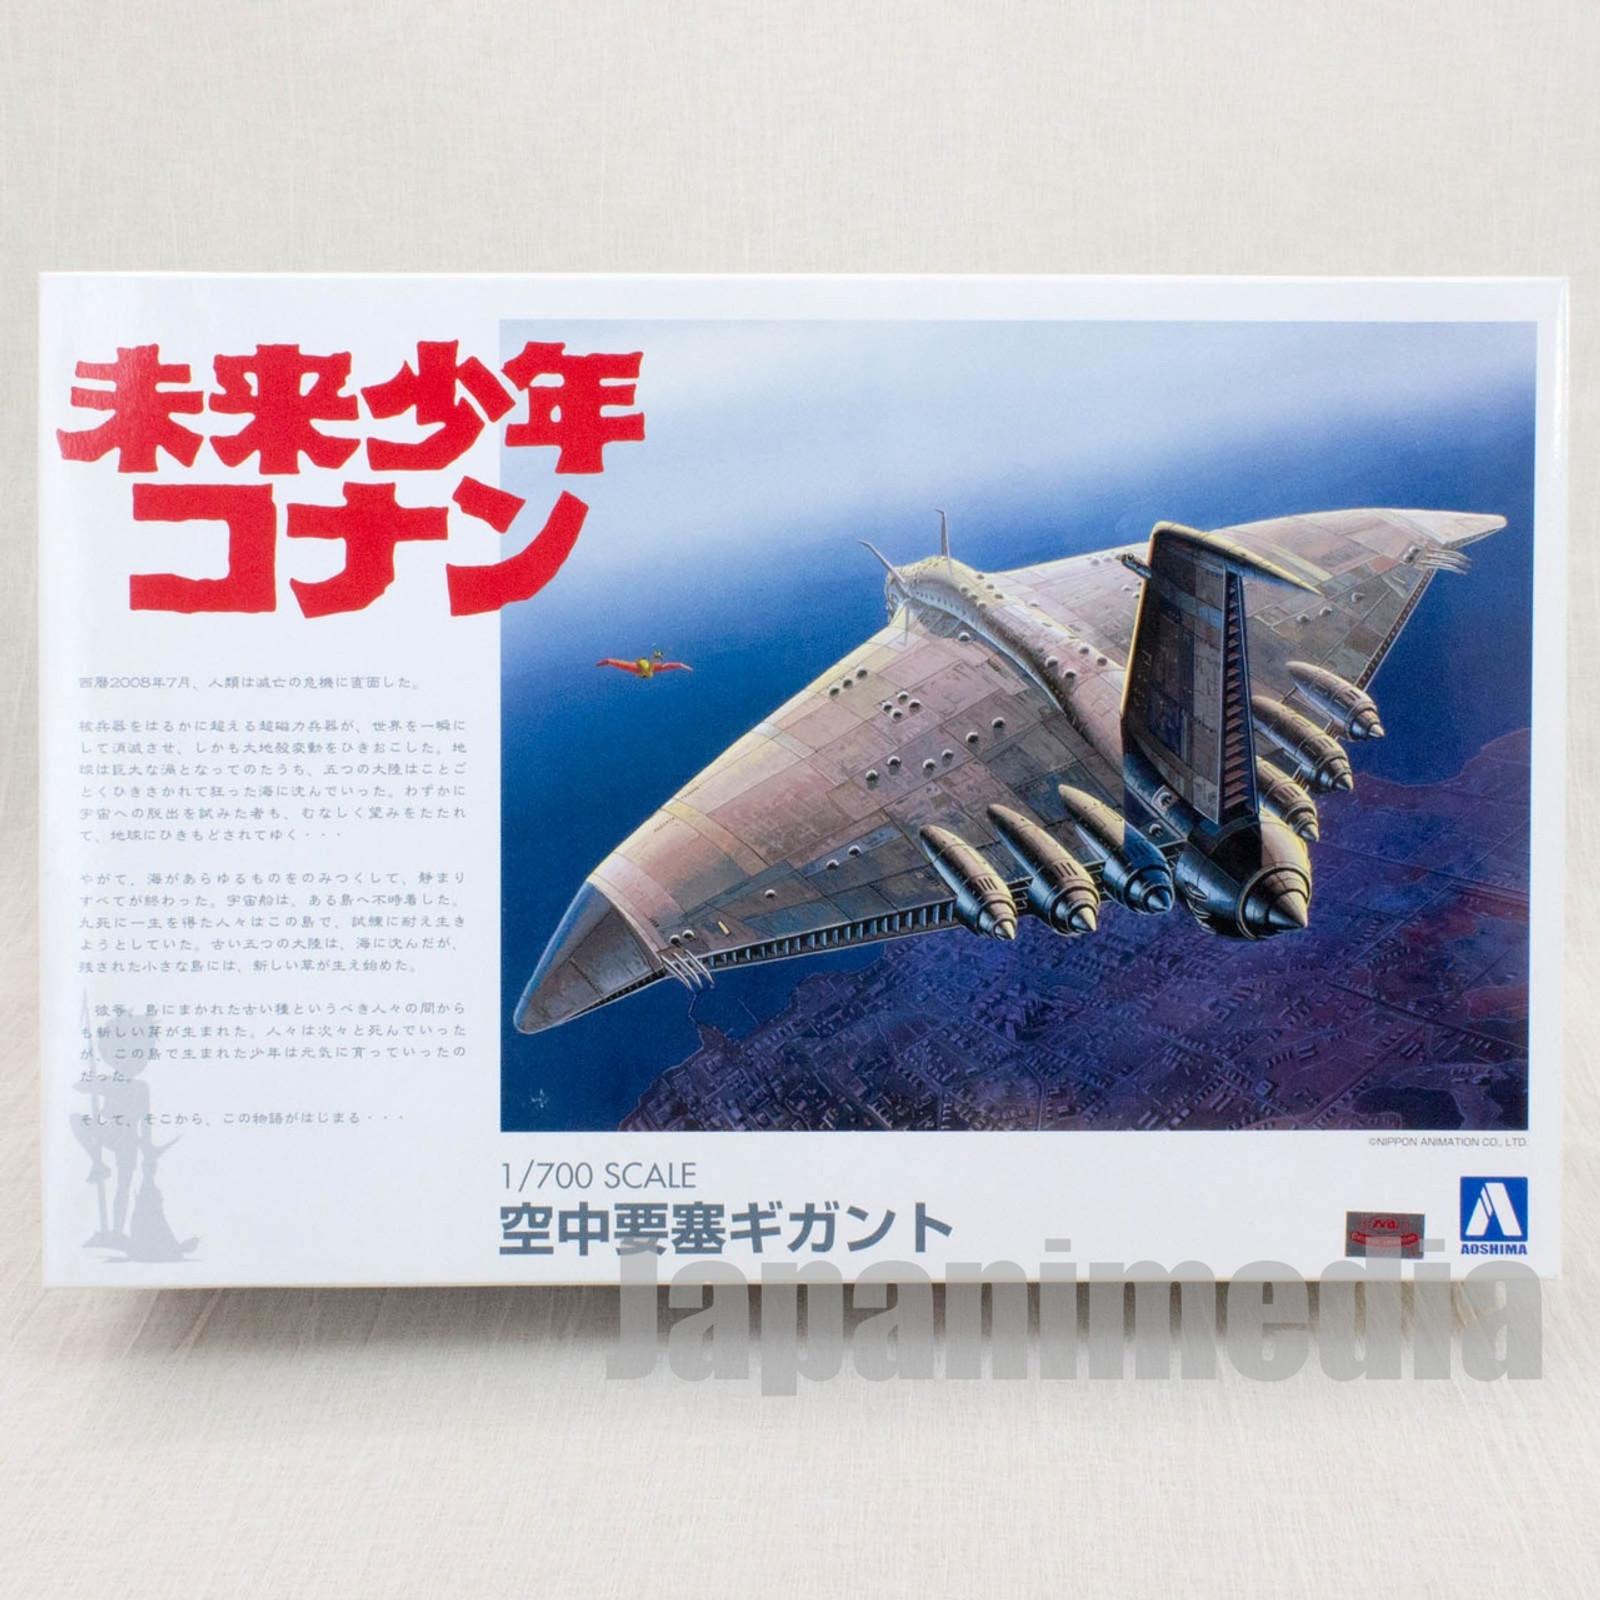 Future Boy Conan Gigant 1/700 Plastic Model Kit JAPAN ANIME HAYAO MIYAZAKI